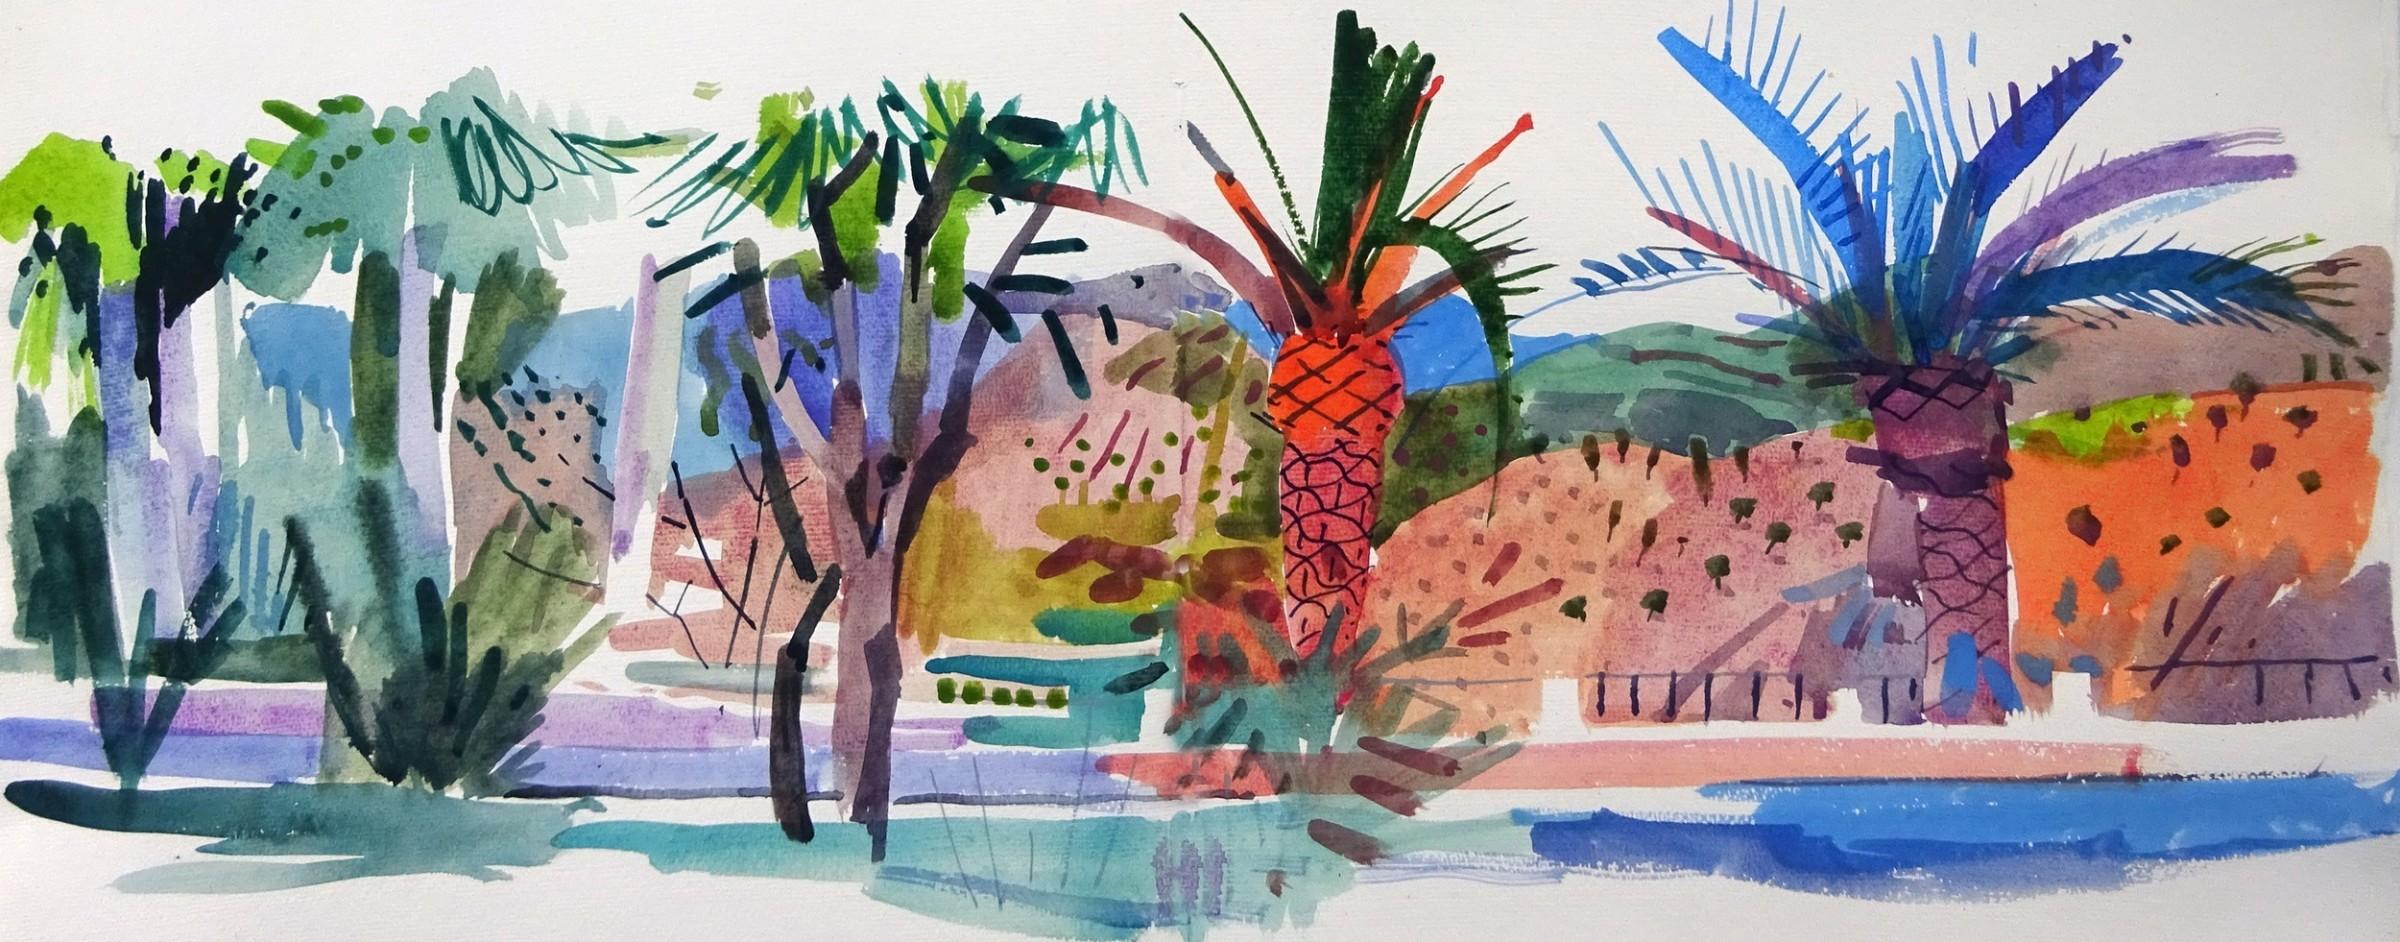 <span class=&#34;link fancybox-details-link&#34;><a href=&#34;/exhibitions/24/works/artworks_standalone10813/&#34;>View Detail Page</a></span><div class=&#34;artist&#34;><span class=&#34;artist&#34;><strong>Jenny Wheatley</strong></span></div><div class=&#34;title&#34;><em>Palms and Eucalyptus</em></div><div class=&#34;medium&#34;>watercolour</div><div class=&#34;dimensions&#34;>50x90cm</div>